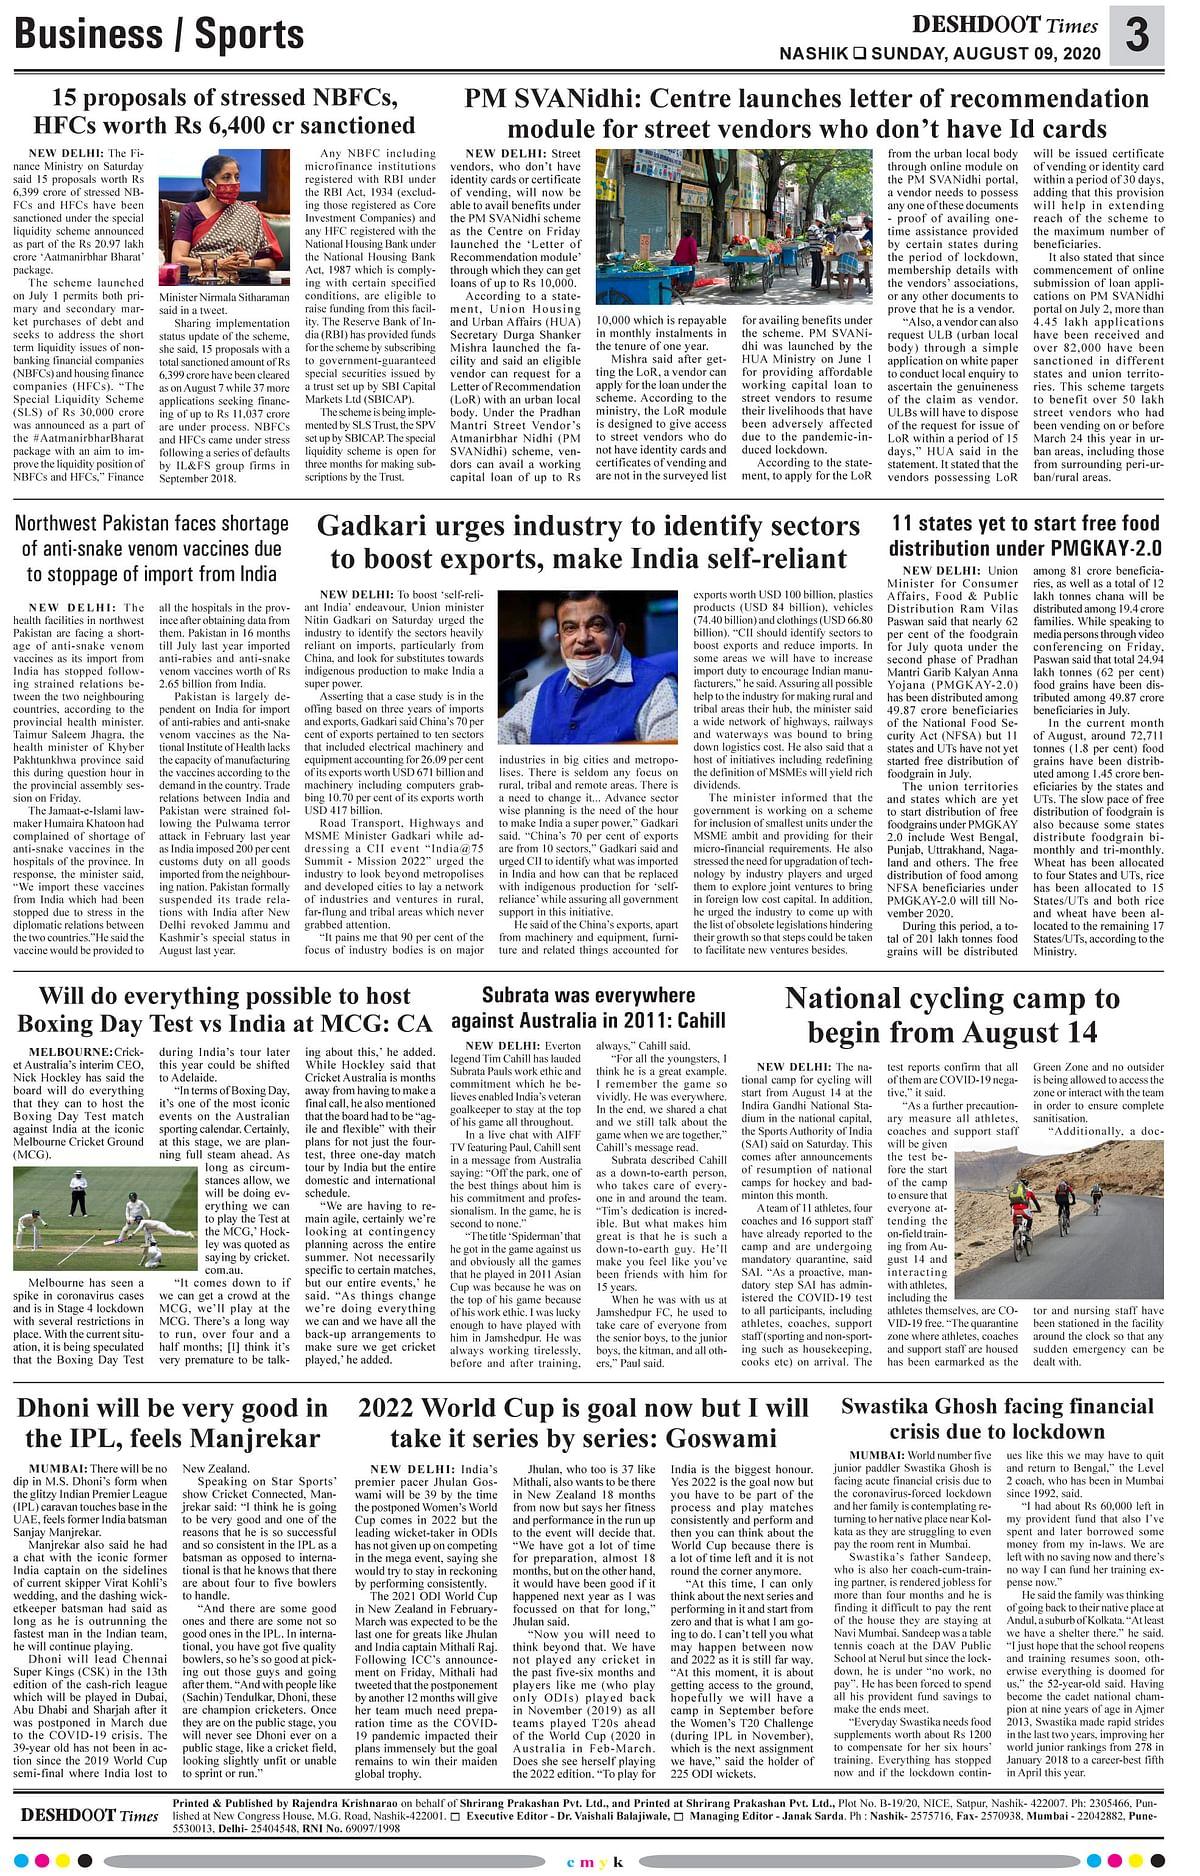 Deshdoot Times E Paper, 9 August 2020